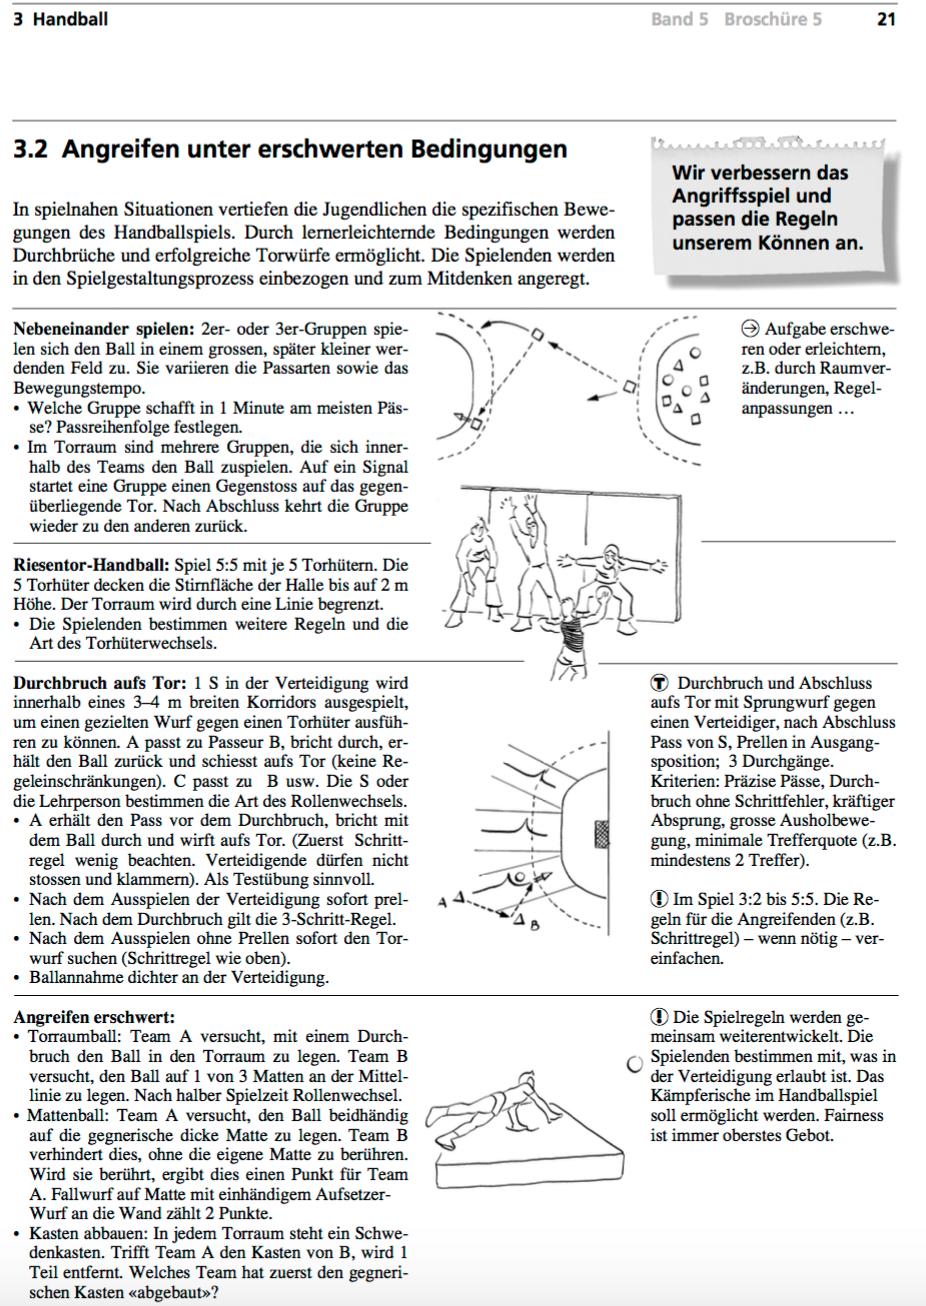 Preview image for LOM object Handball - Angreifen unter erschwerten Bedingungen